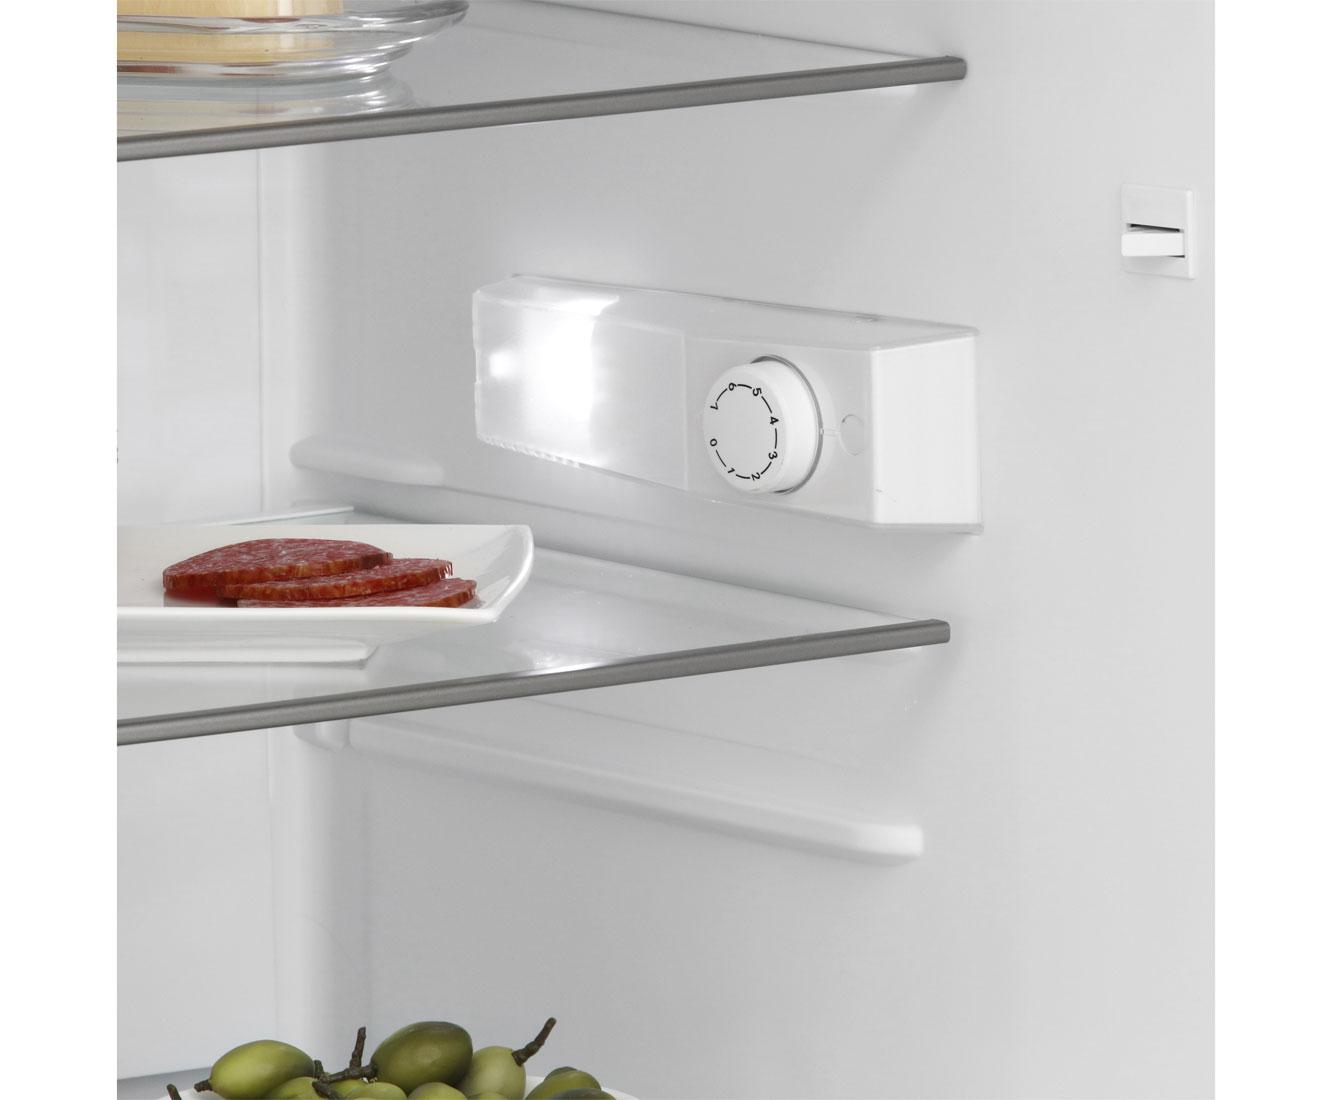 Bomann Kühlschrank Ersatzteile : Bomann kühlschrank ersatzteile: kühlschrank und gefriertruhe weitere